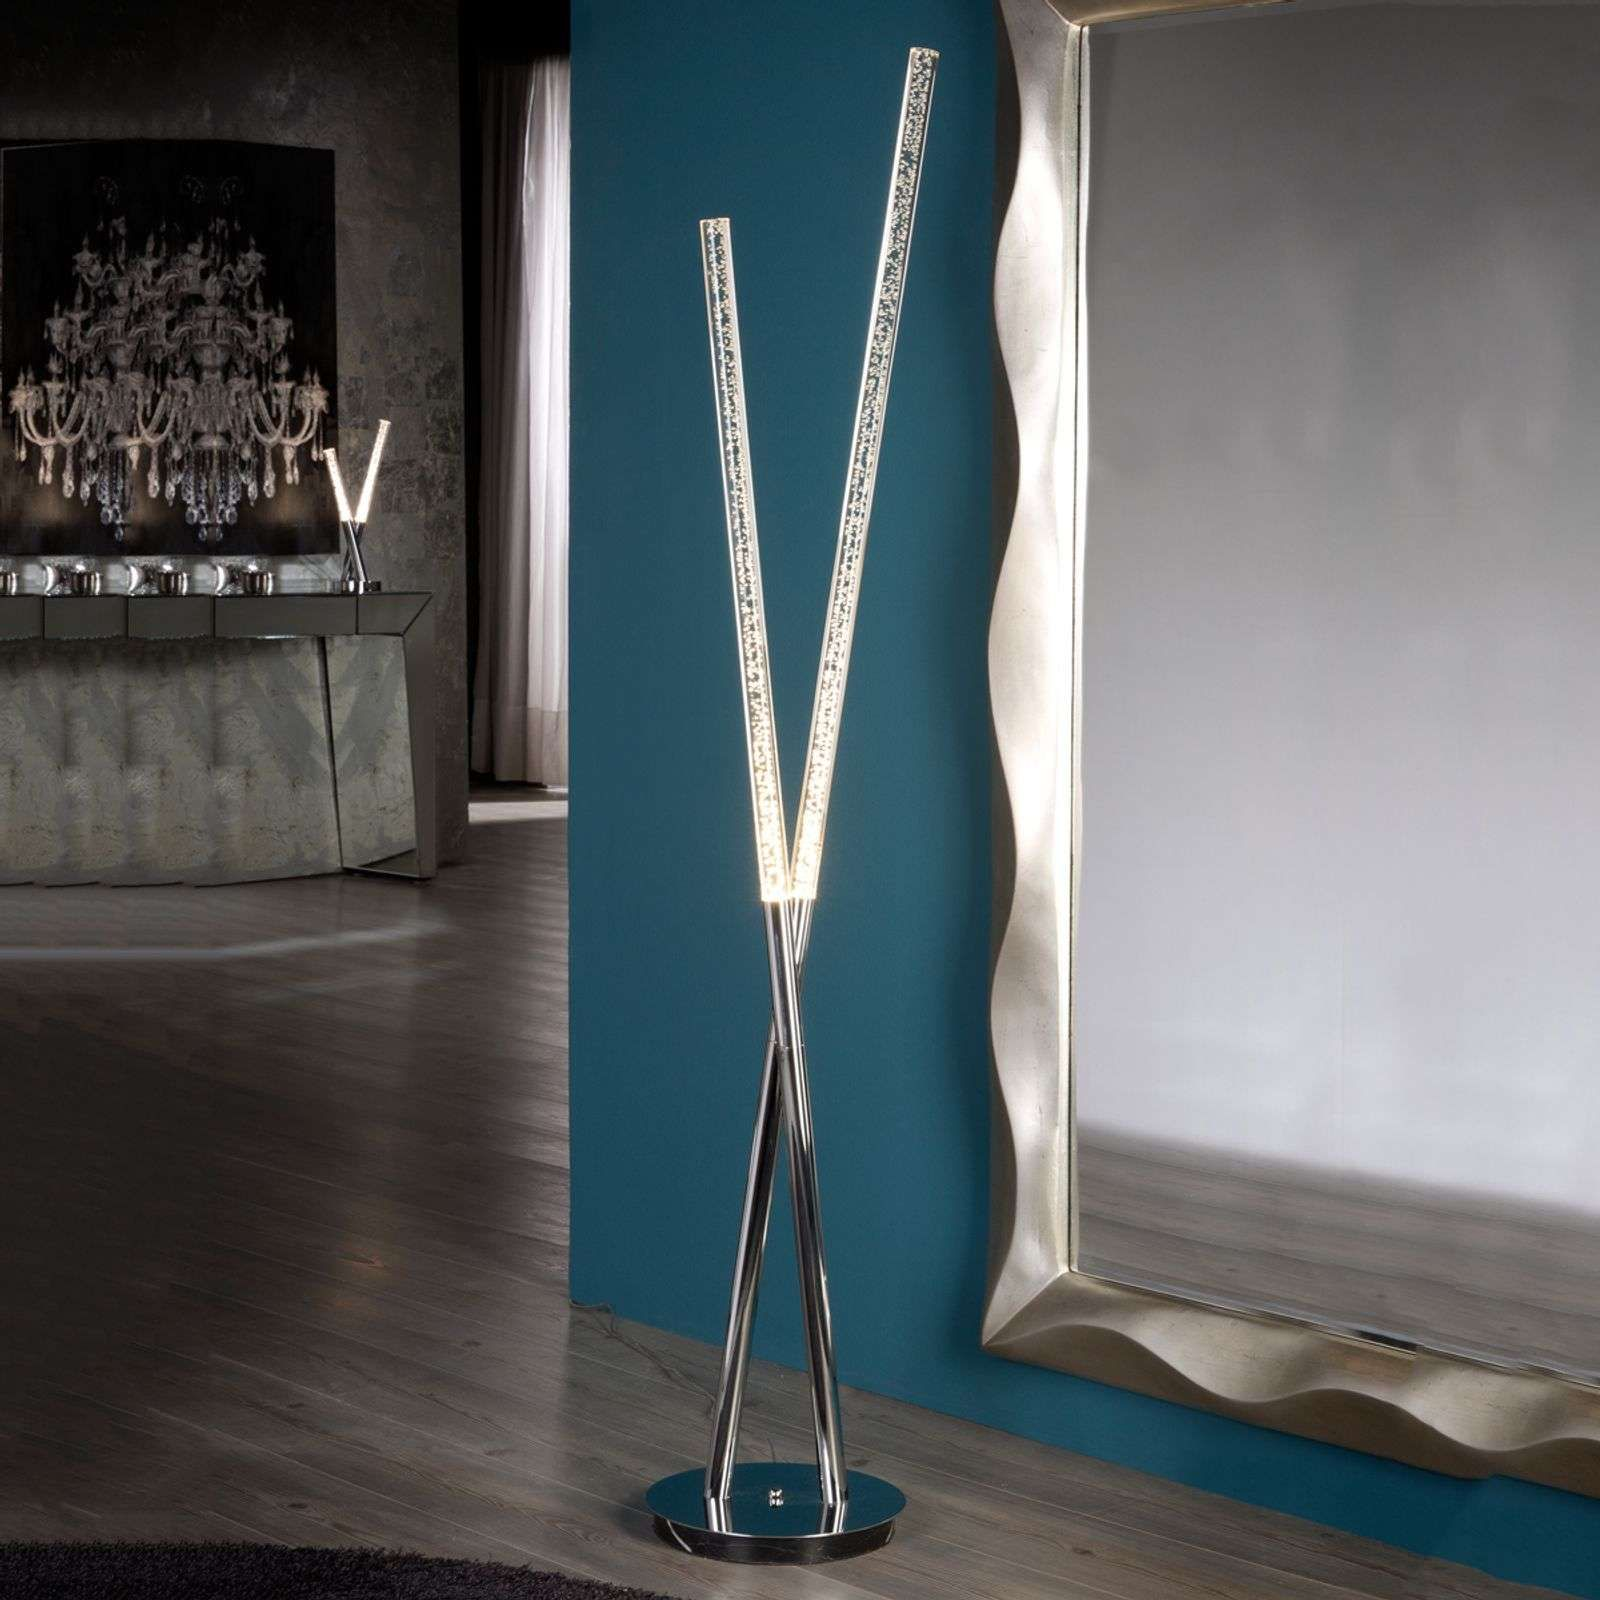 Glanzende Led Stehleuchte Cosmo Mit Acrylrohren Tube Acrylique